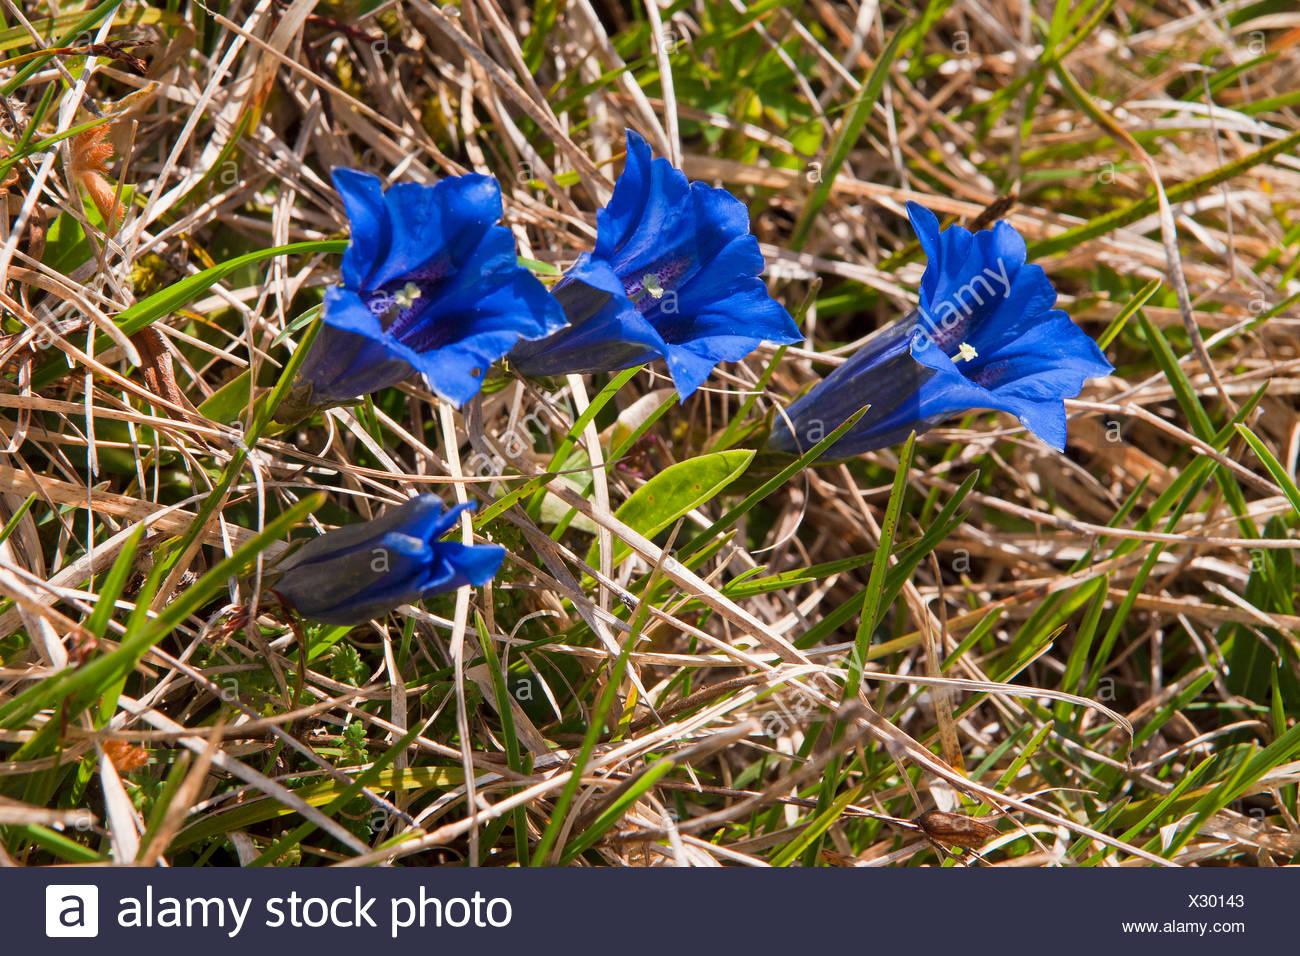 Bavaria, Europe, Germany, flower, mountain flower, gentians, mountain gentian, Clusius gentian, Gentiana clusii, blue, cup, alp, - Stock Image